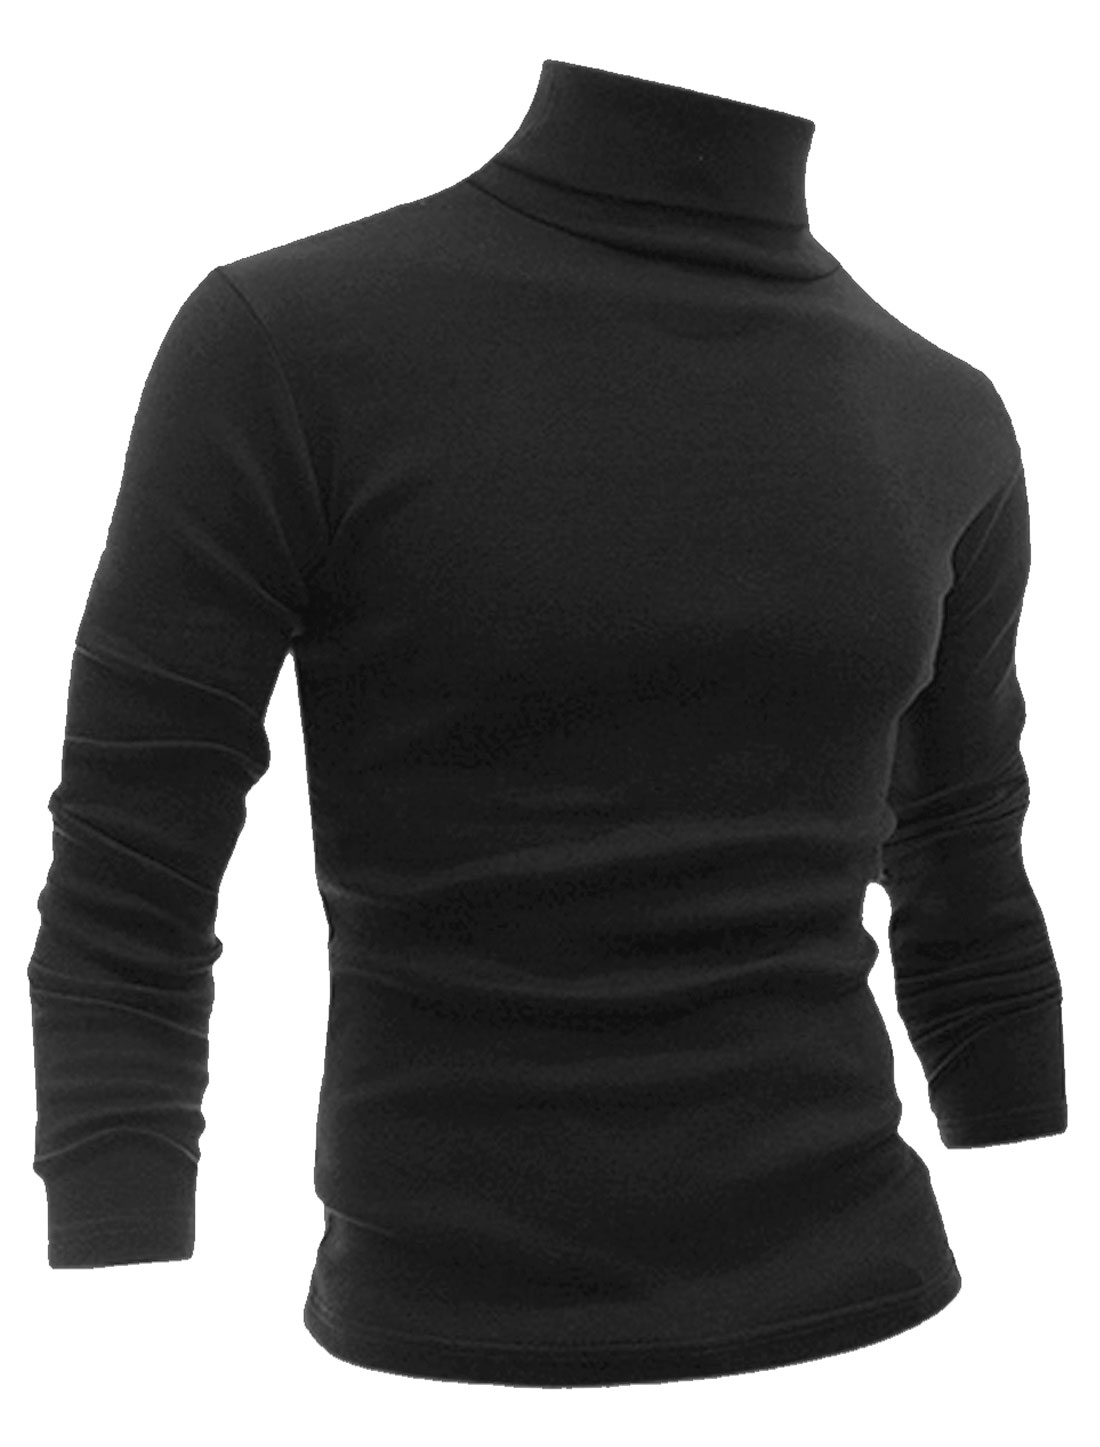 Men Slim Fit Pullover Tops Turtleneck T-shirt Black XL XL (US 46)